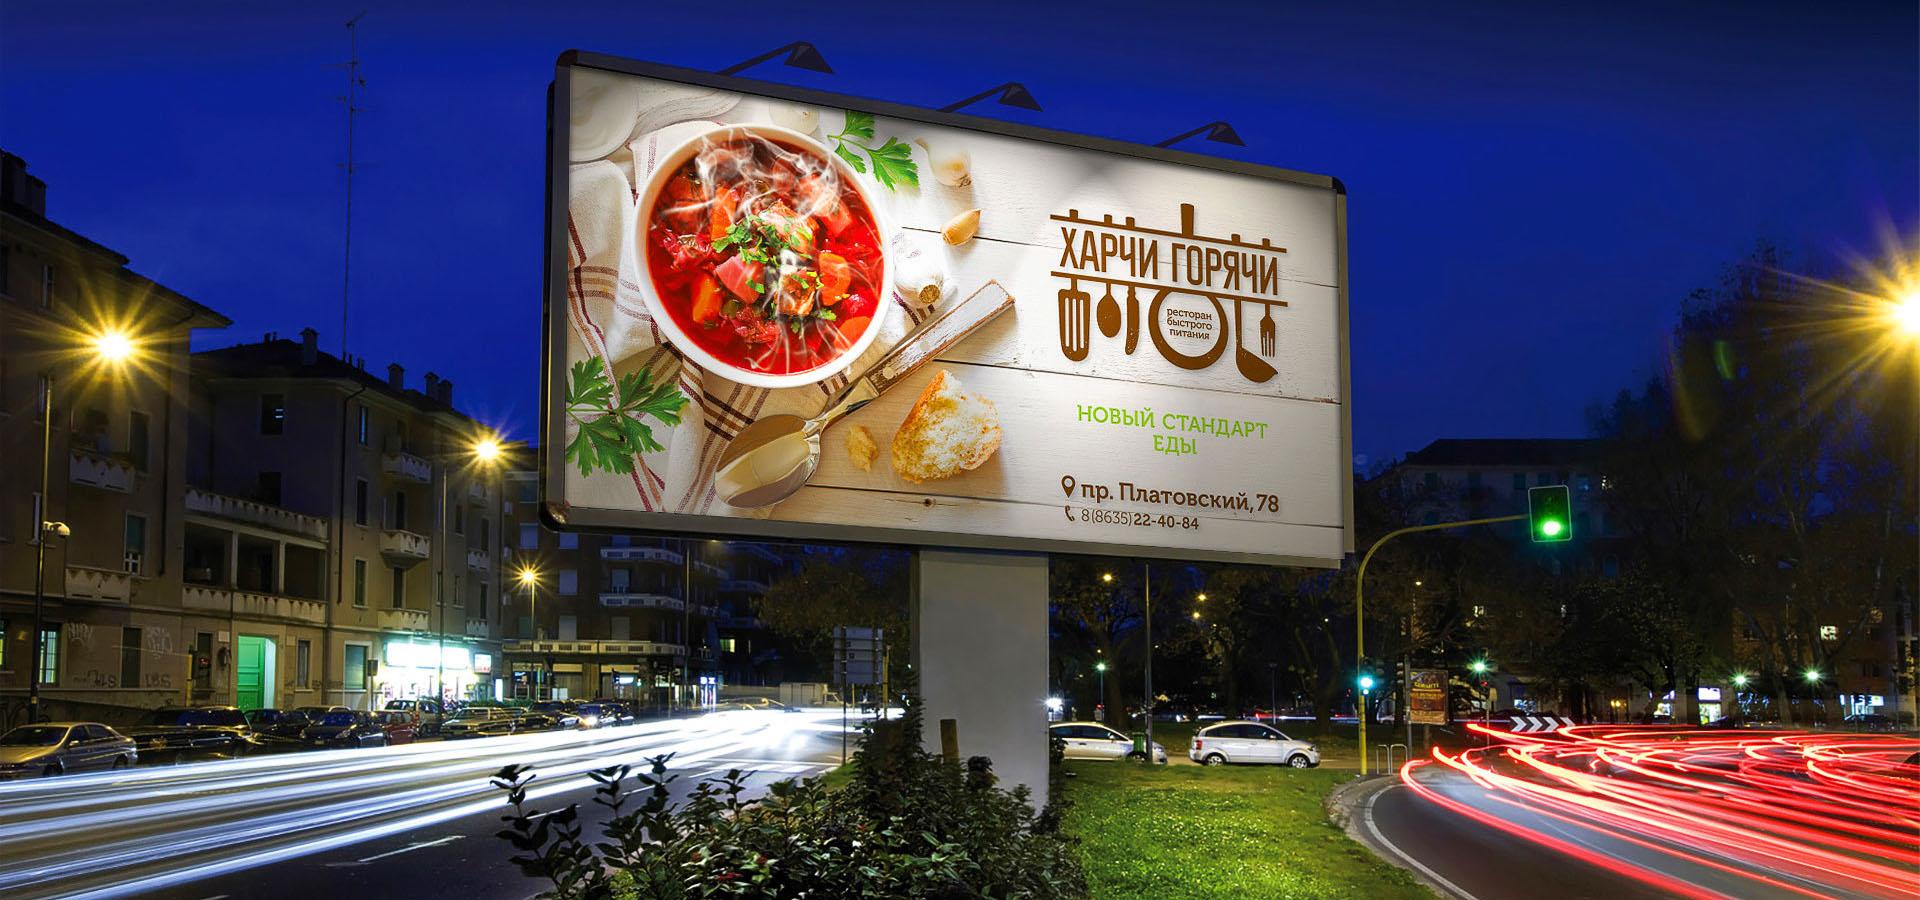 Реклама картинки рестораны кафе